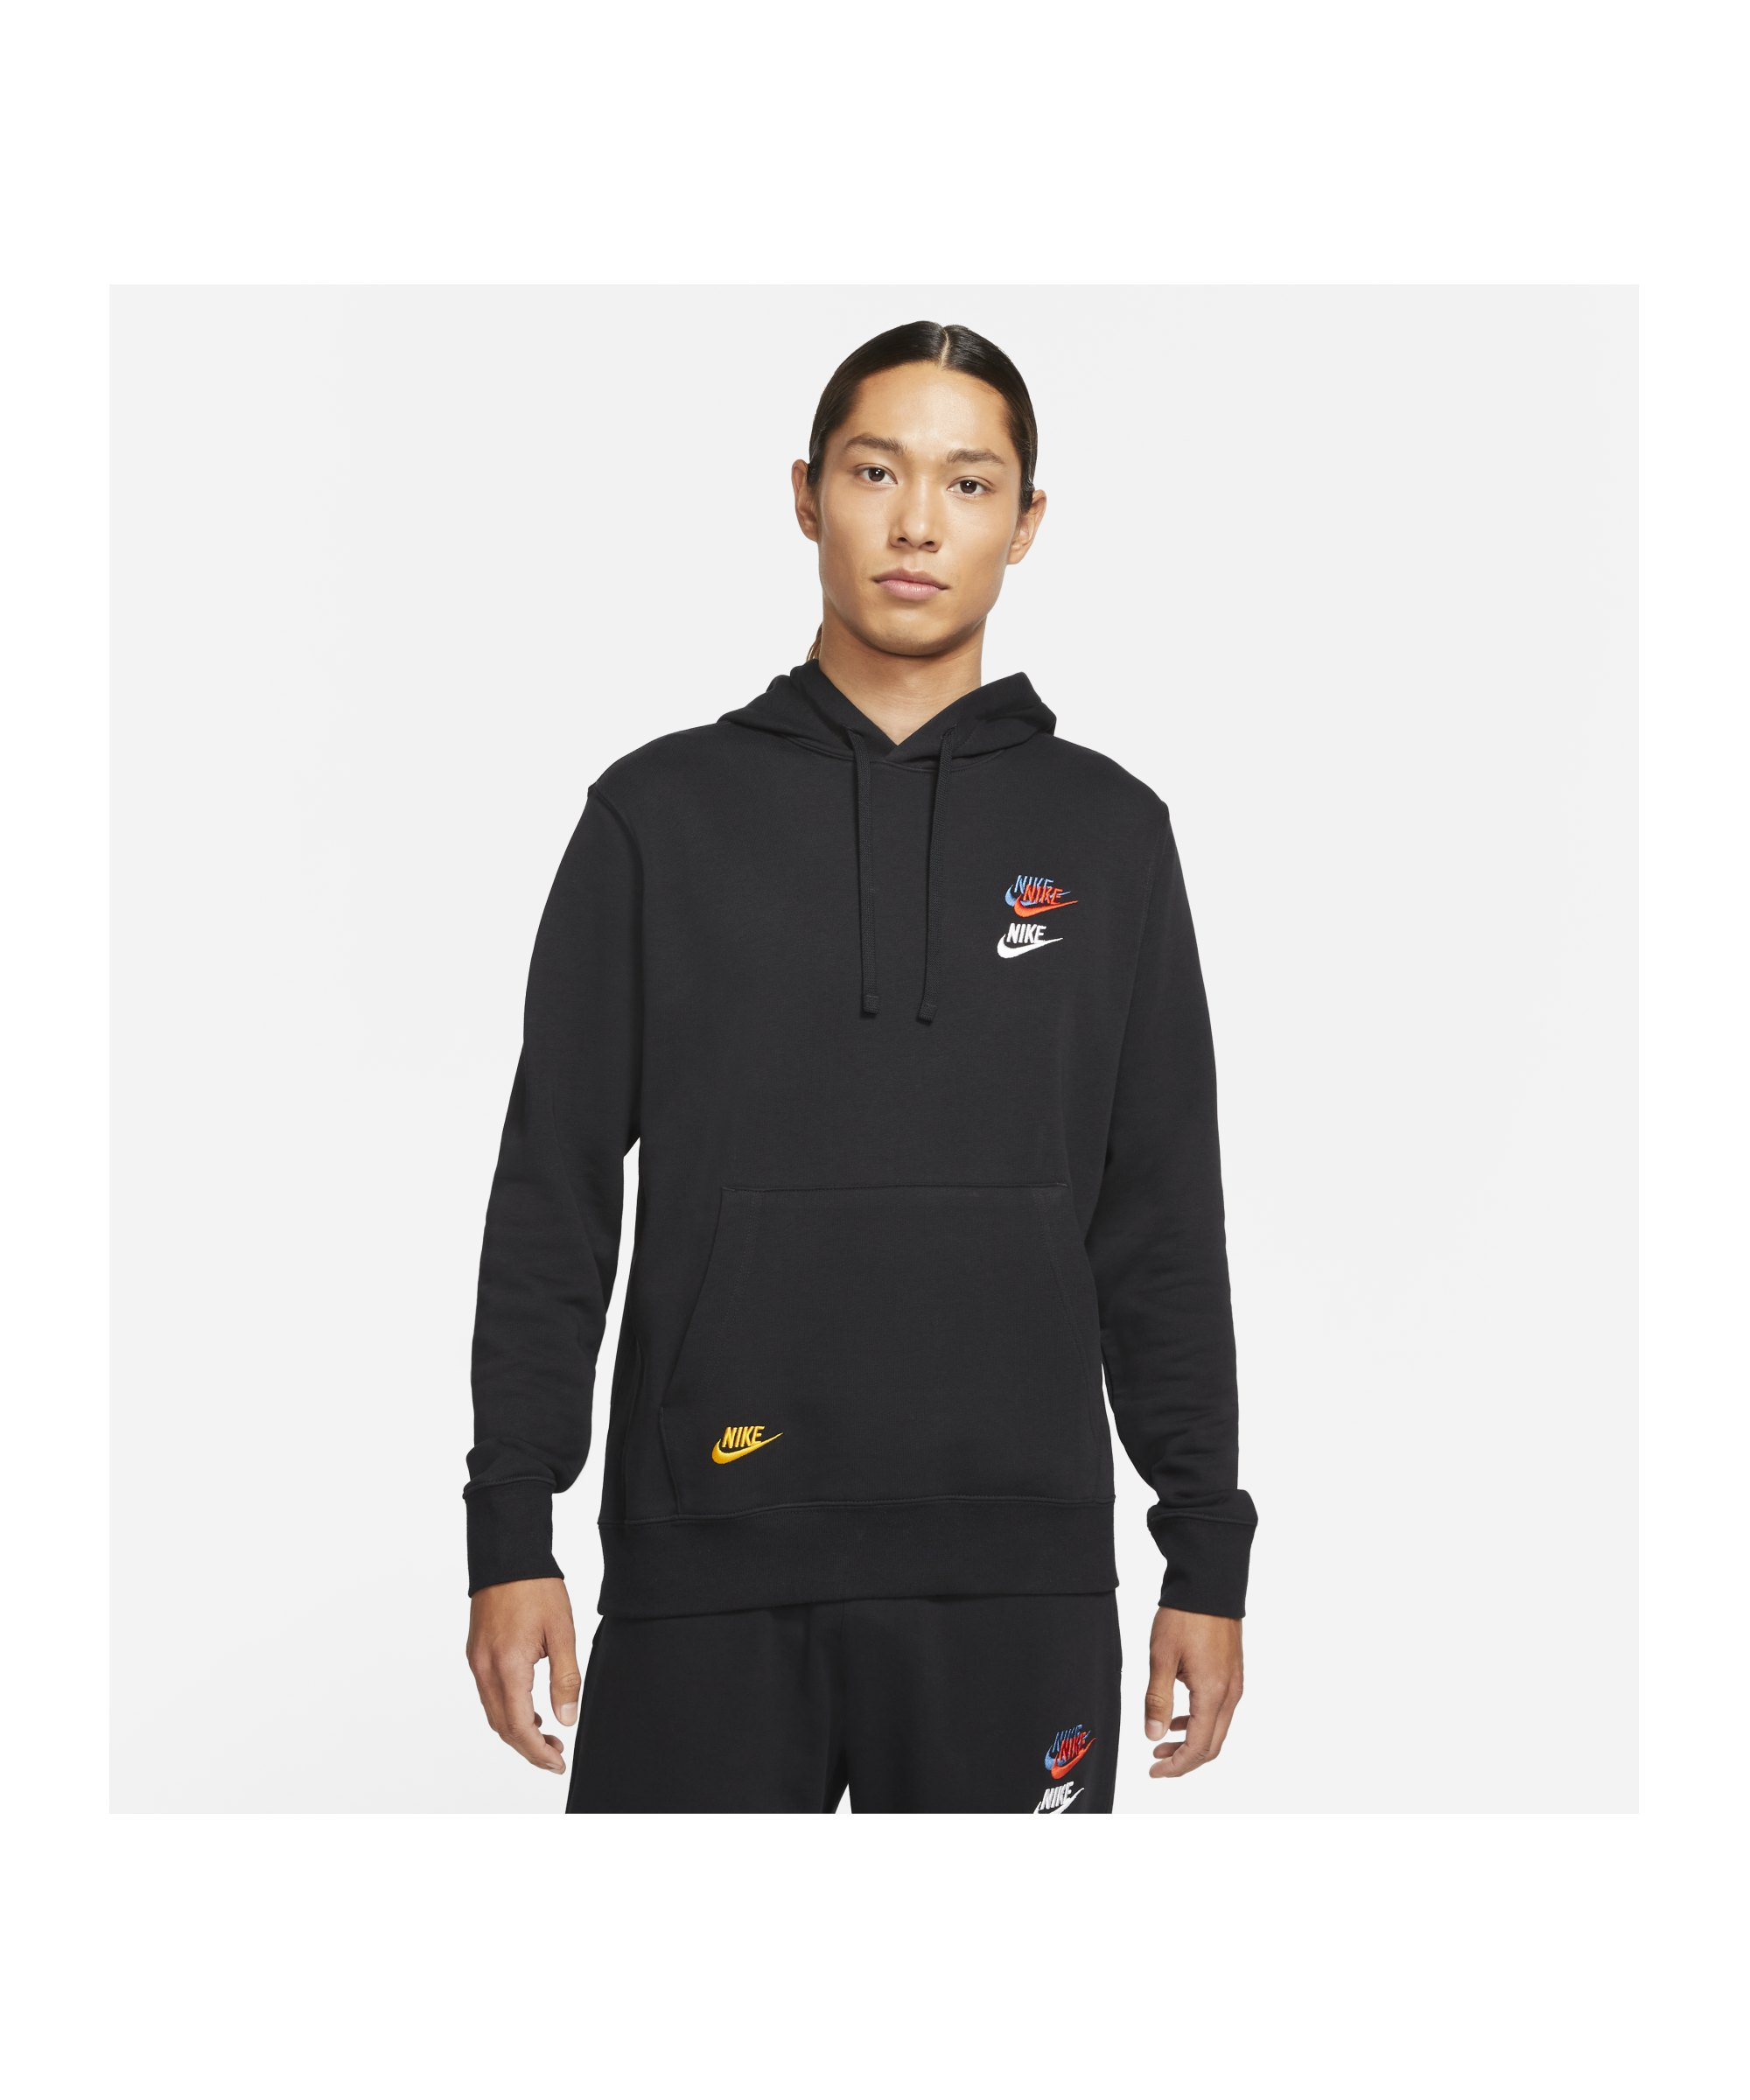 Nike Essentials+ French Terry Hoody F010 - schwarz